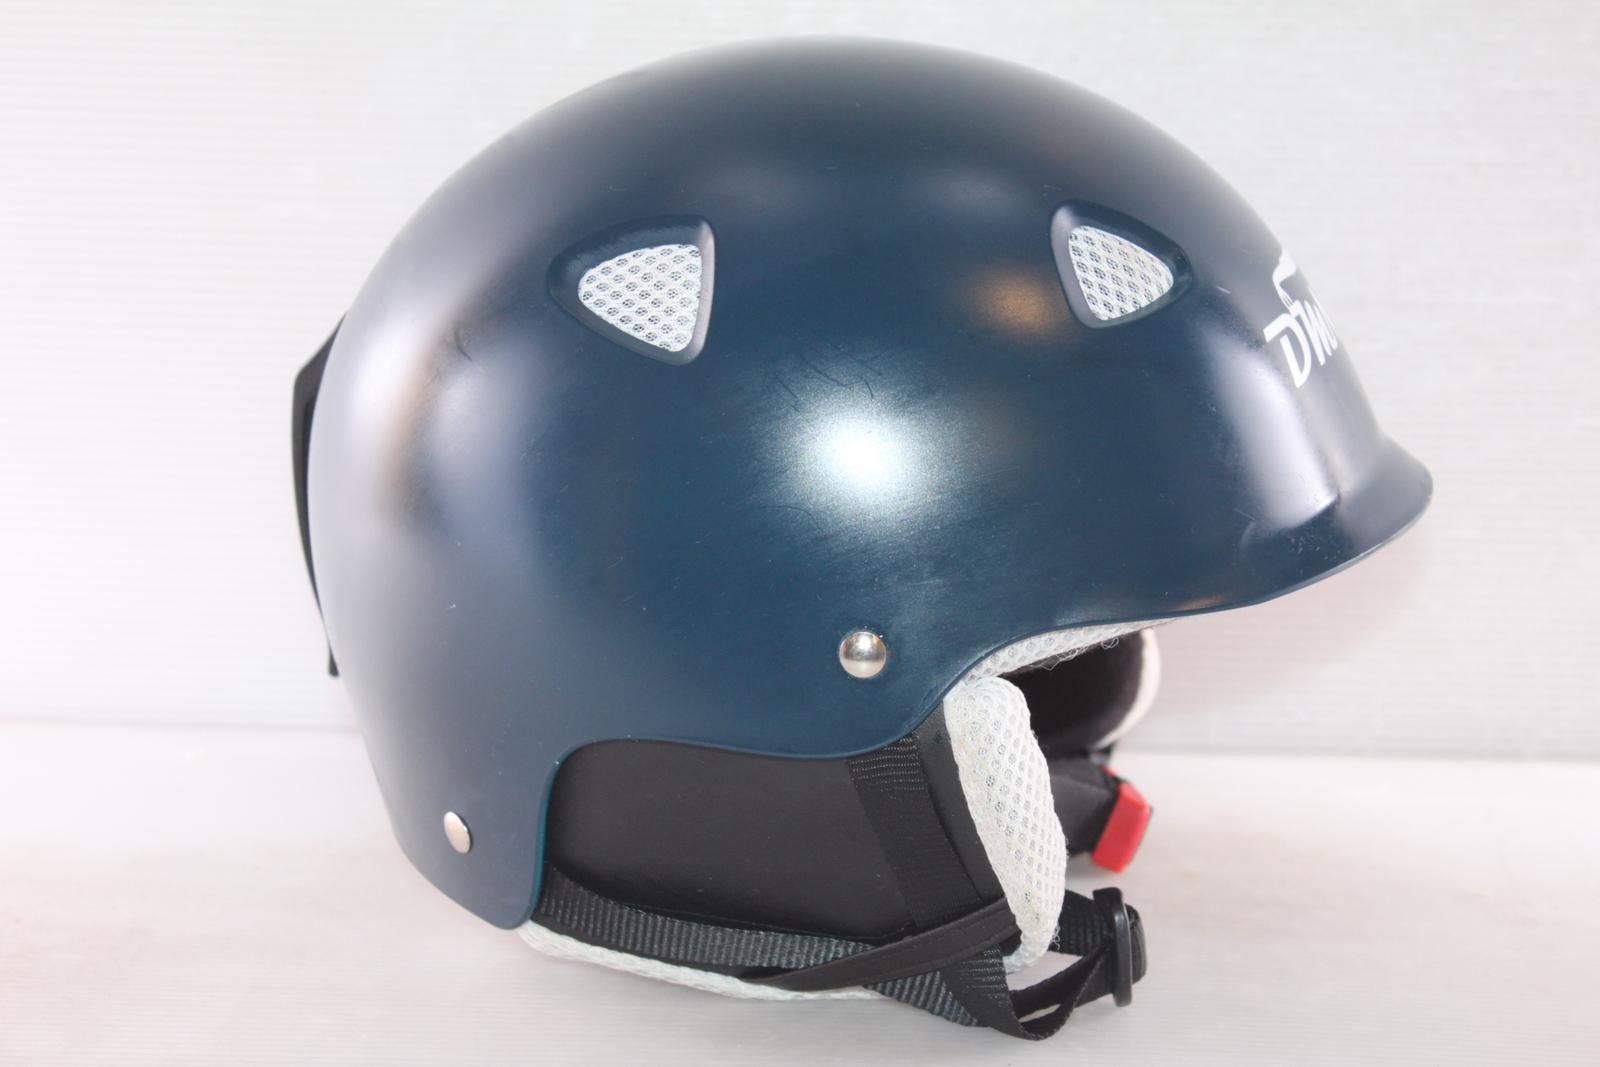 Lyžařská helma DMN DMN - posuvná vel. 58 - 60